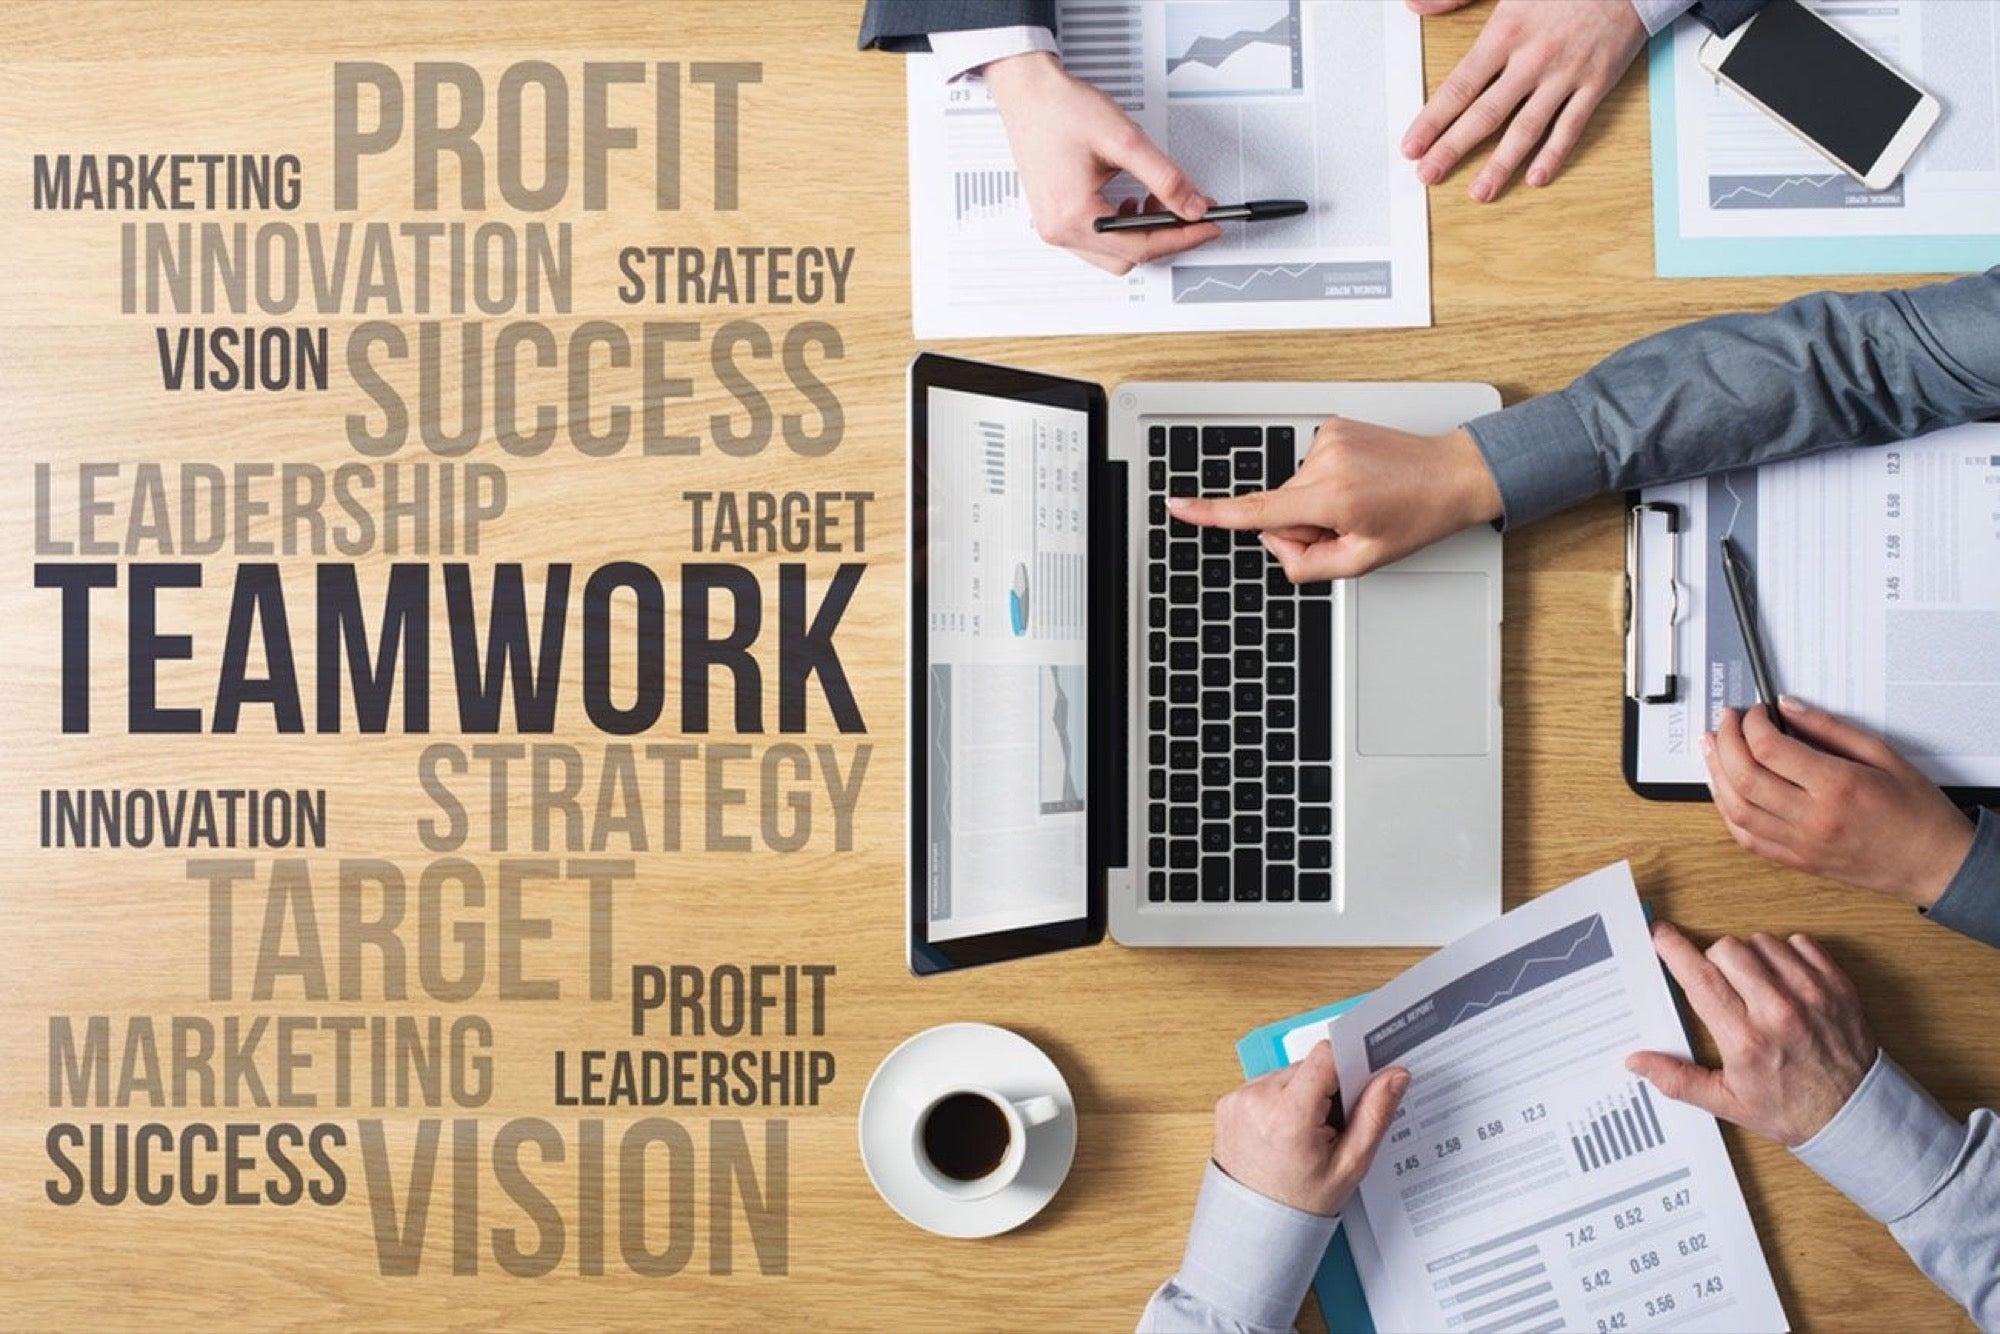 business team shutterstock concepts success building entrepreneur build why principles money marketing credit ways words royalty 3d background 2000 essential